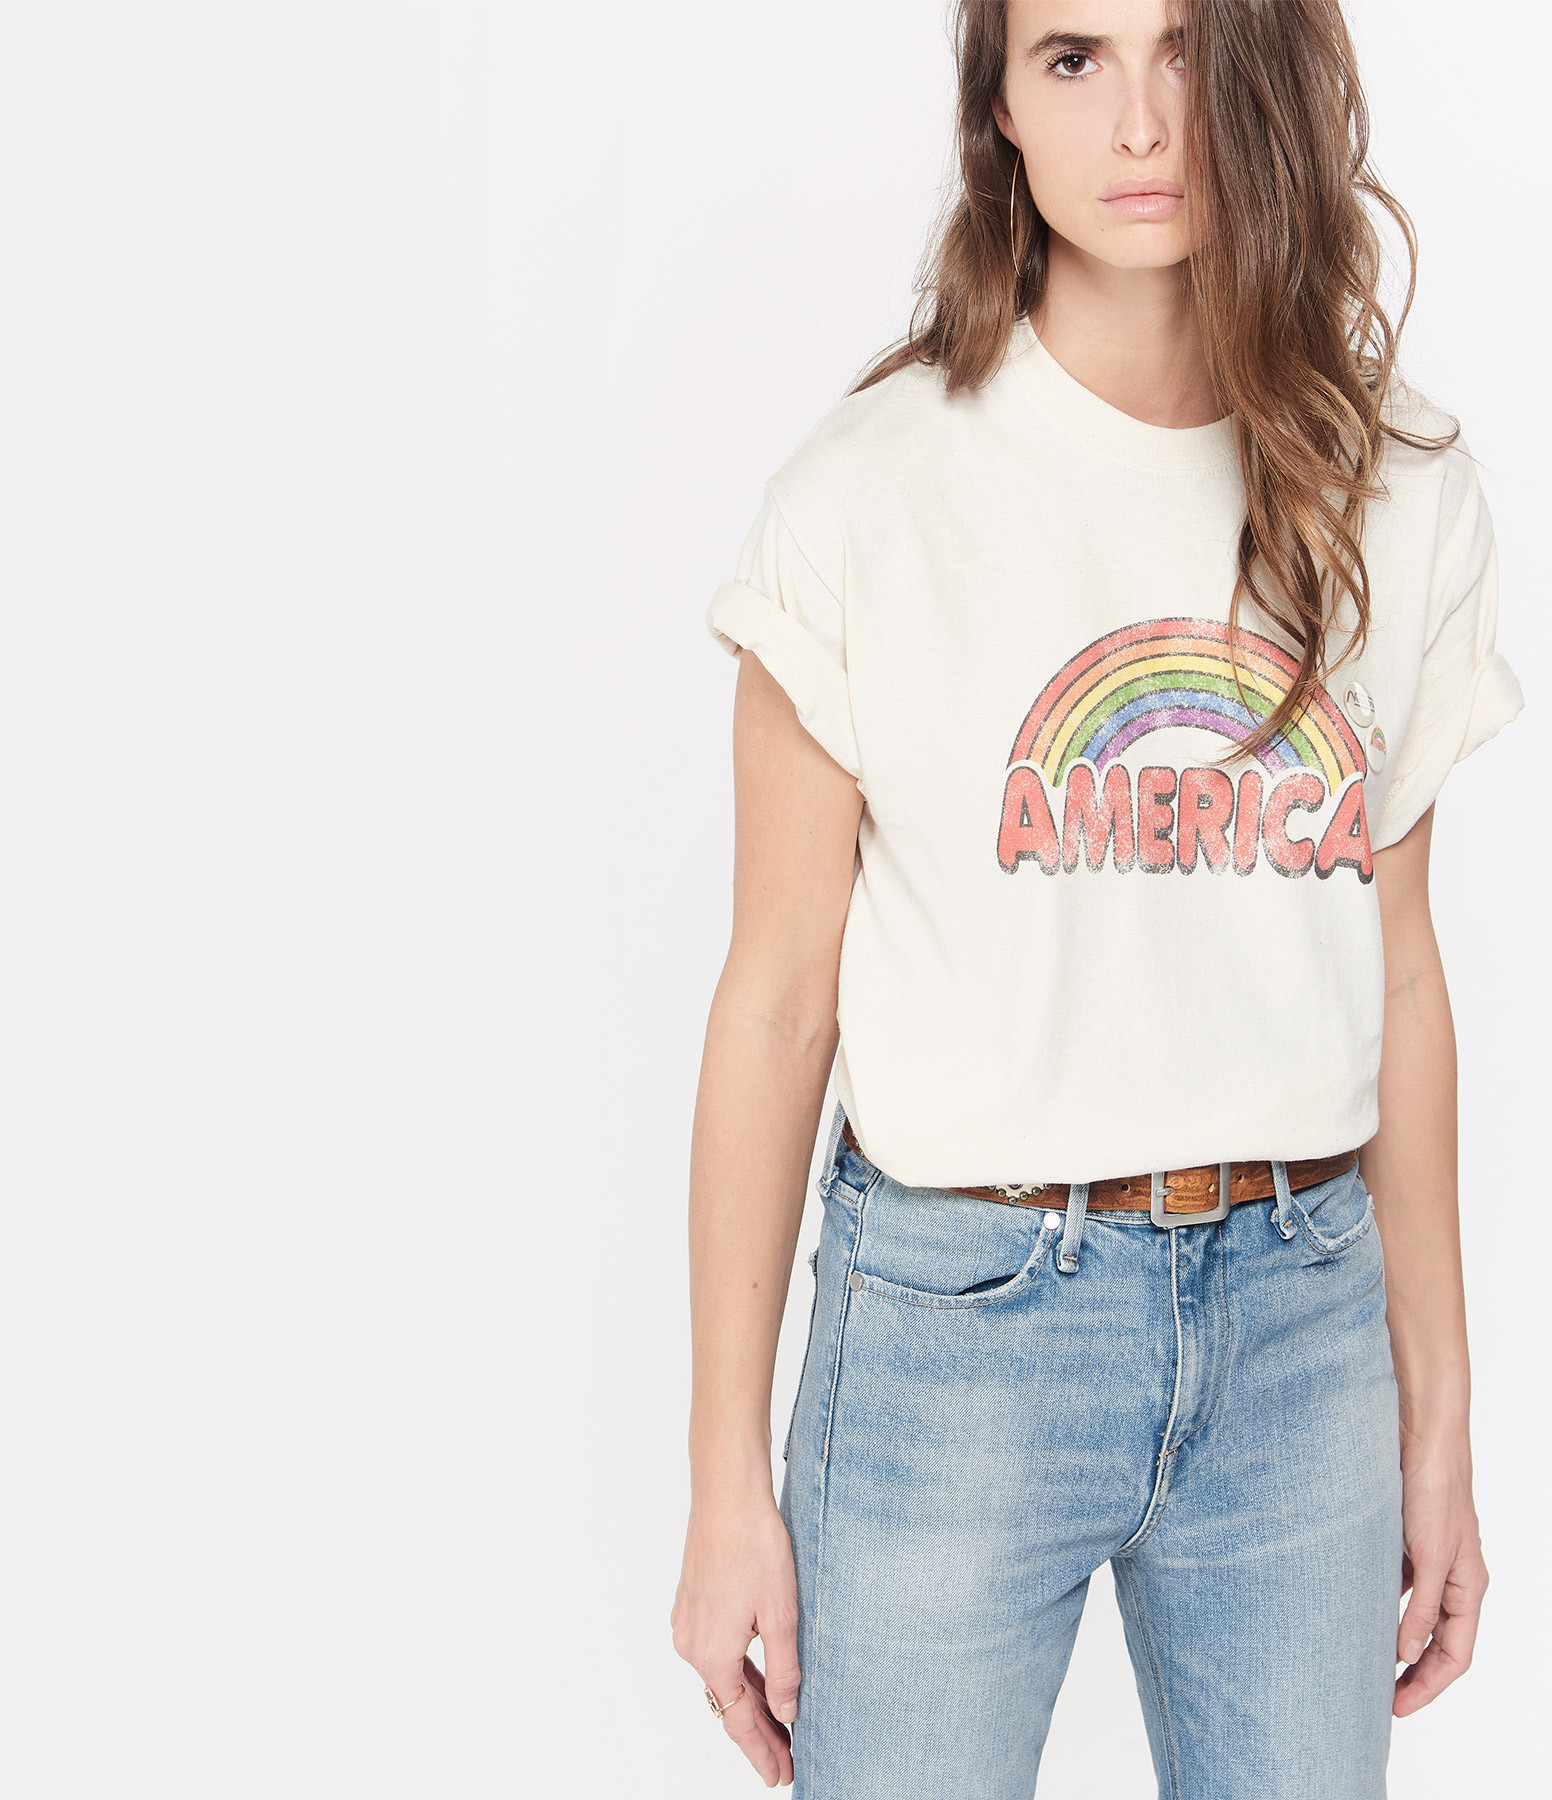 NEWTONE - Tee-shirt America Coton Naturel